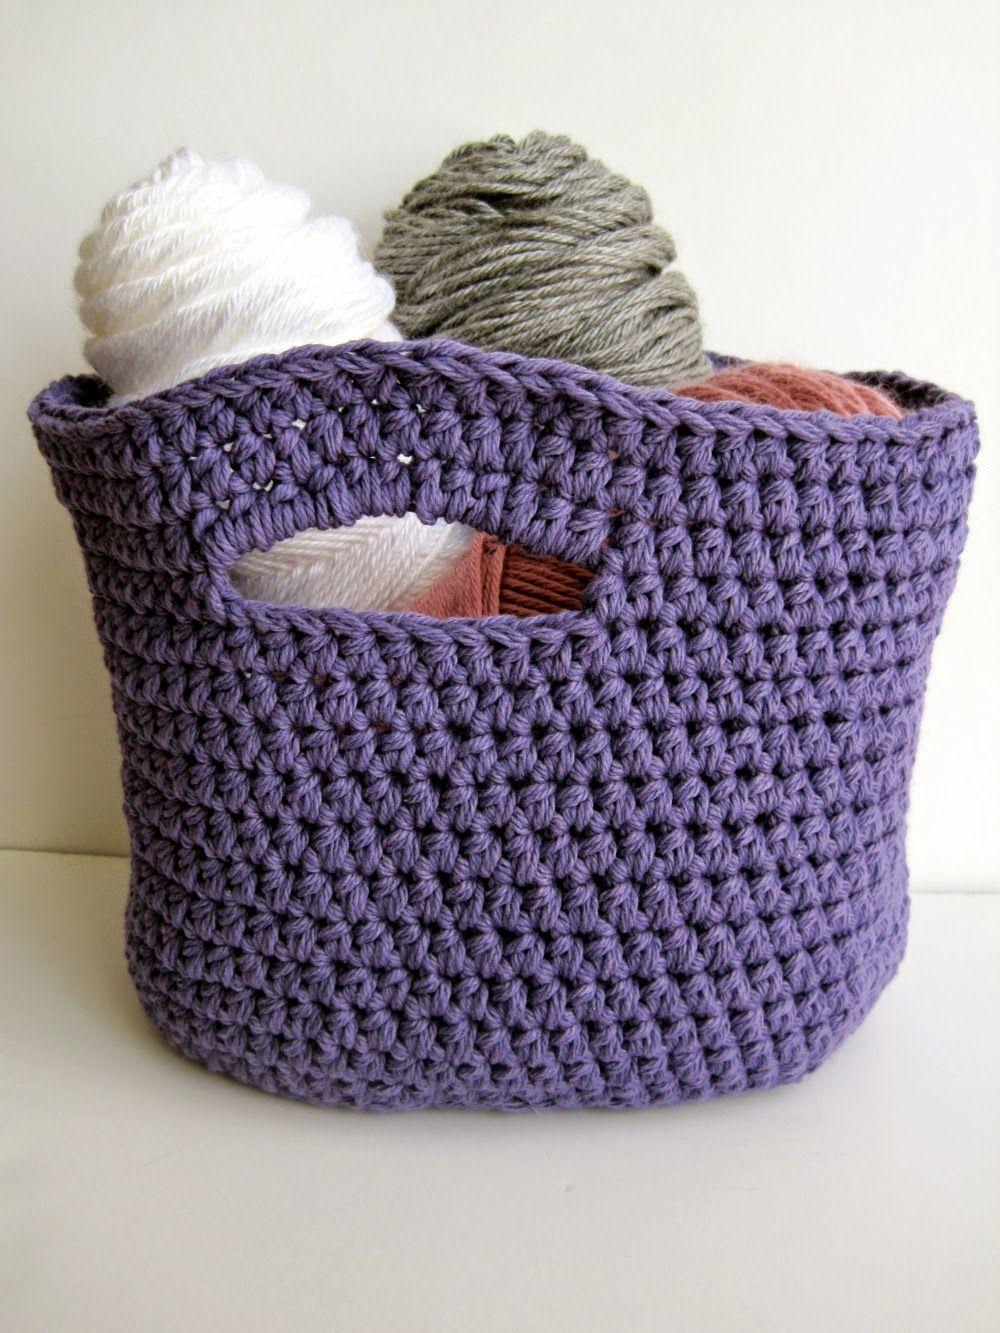 DIY: crochet basket | Crochet-Other | Pinterest | Trapillo, Tejido y ...